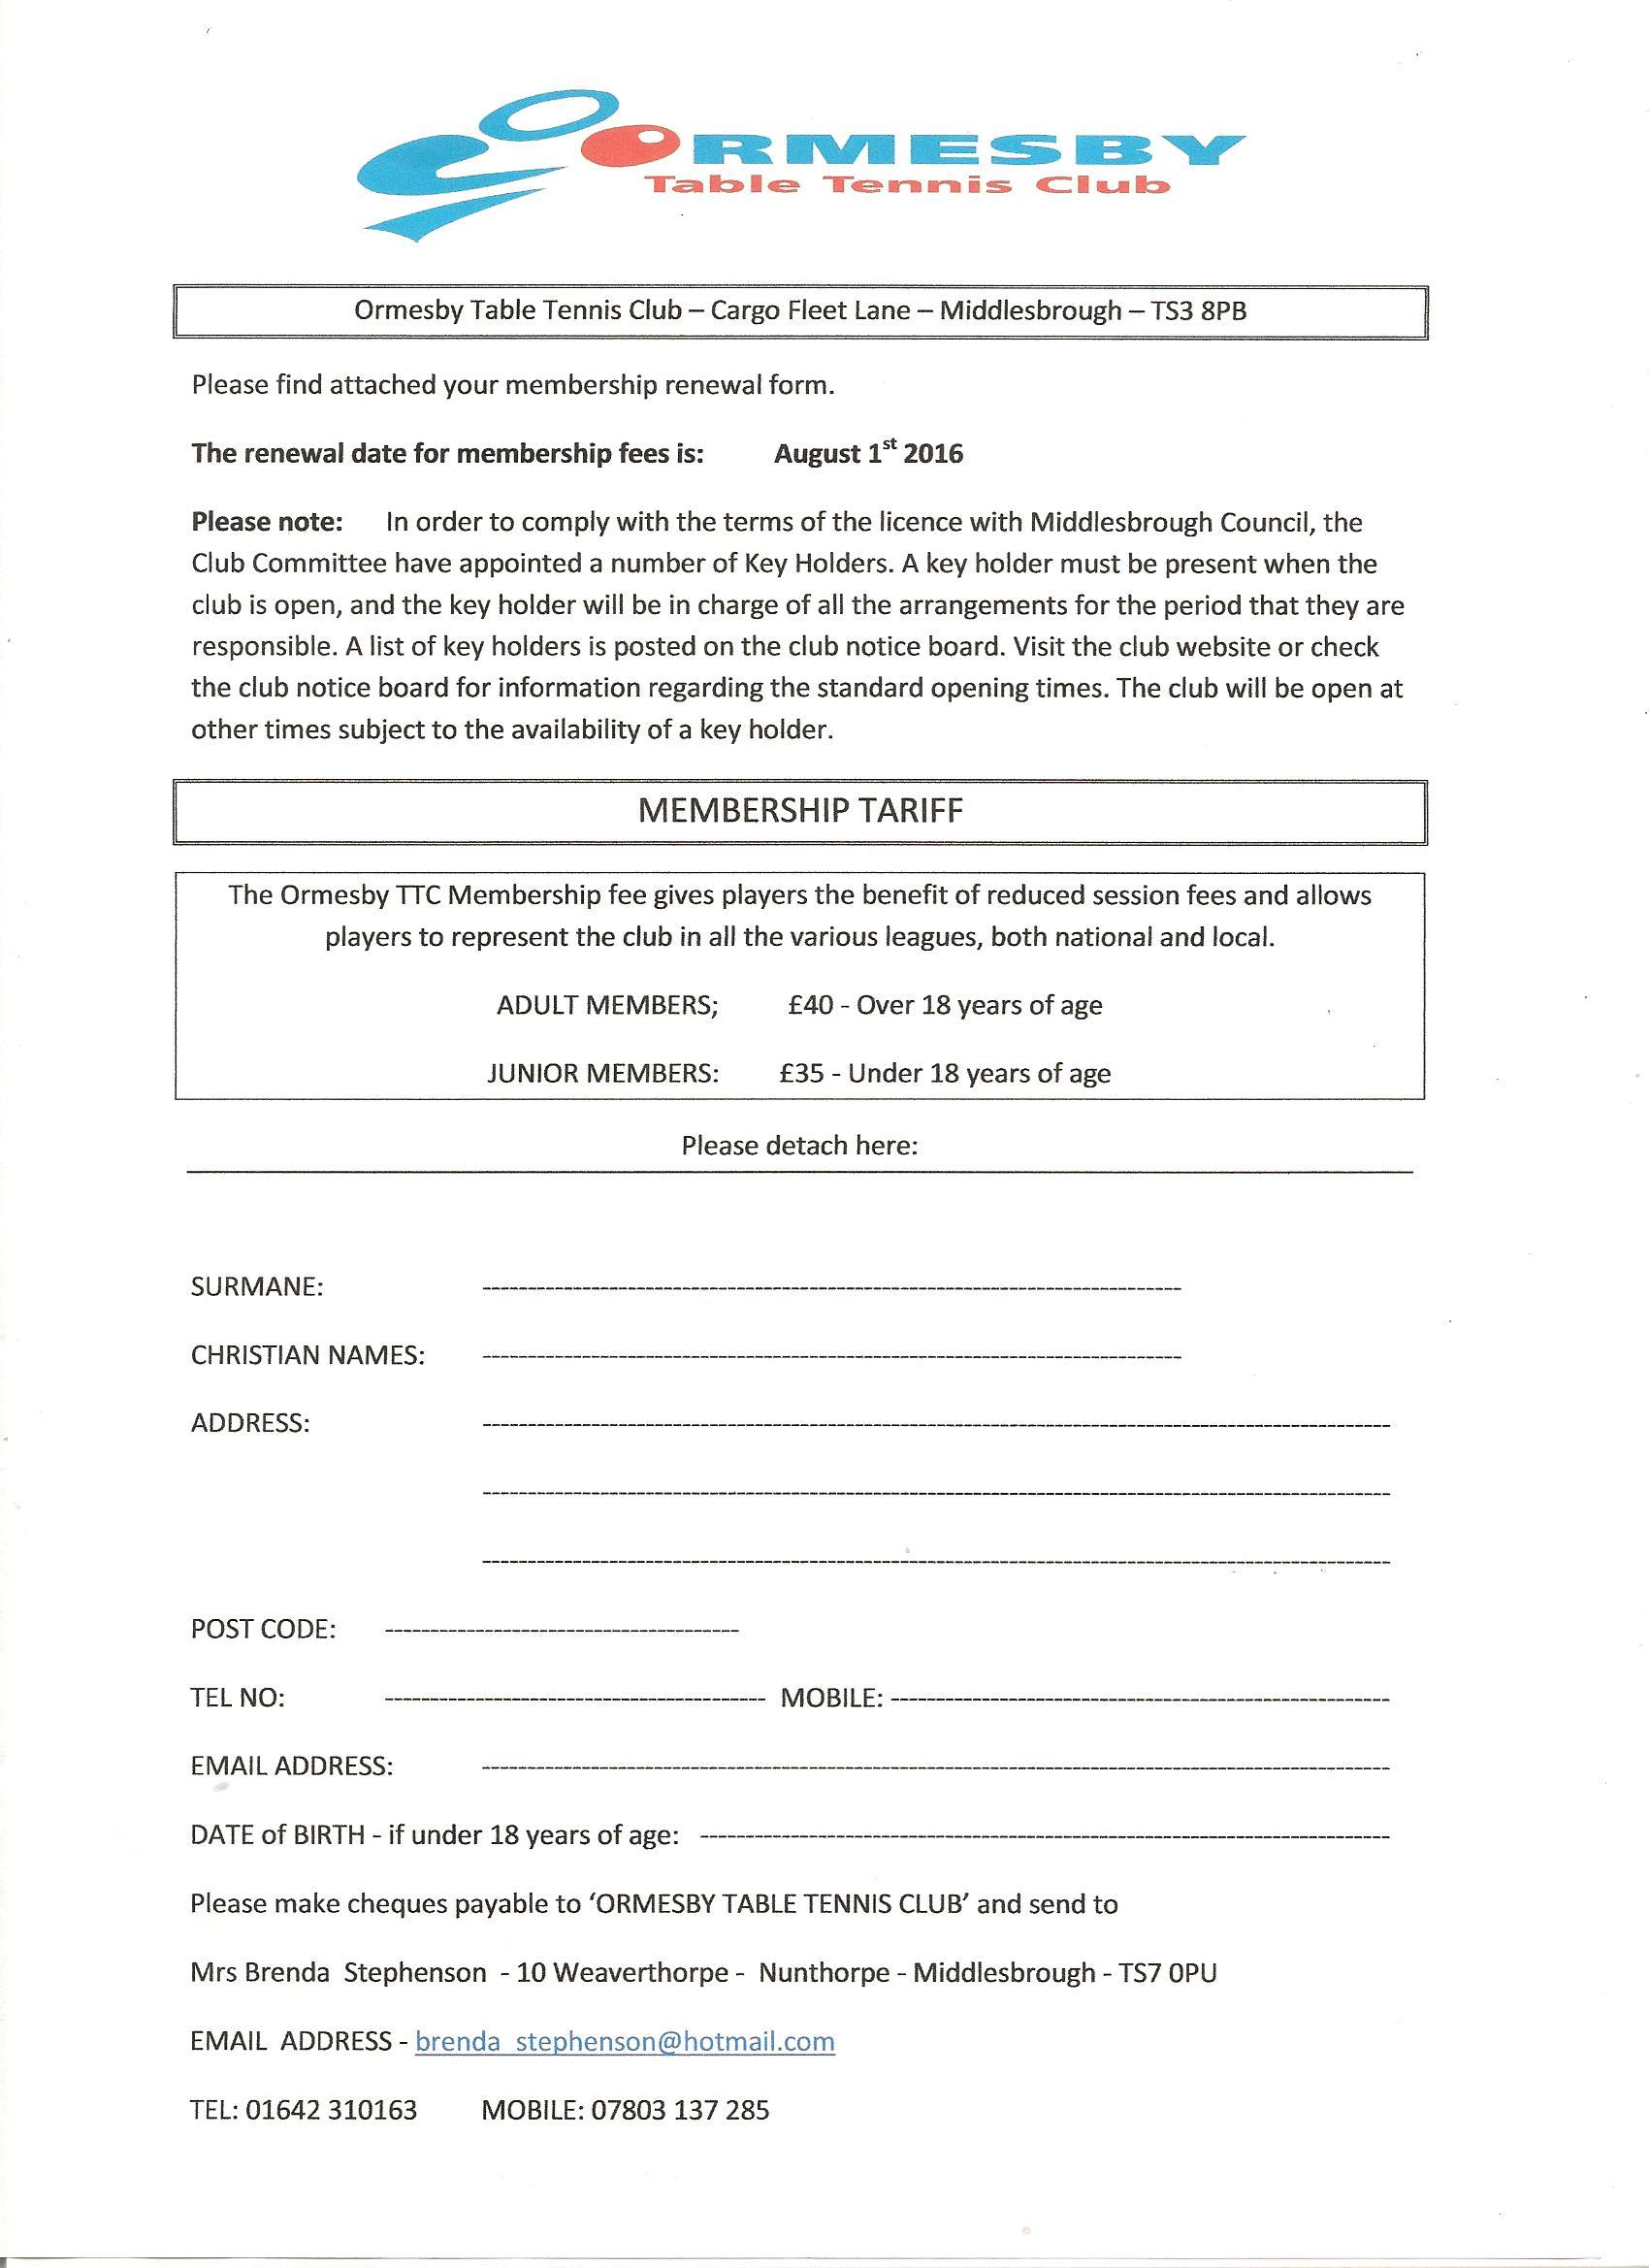 OTTC Membership Form 201617 001